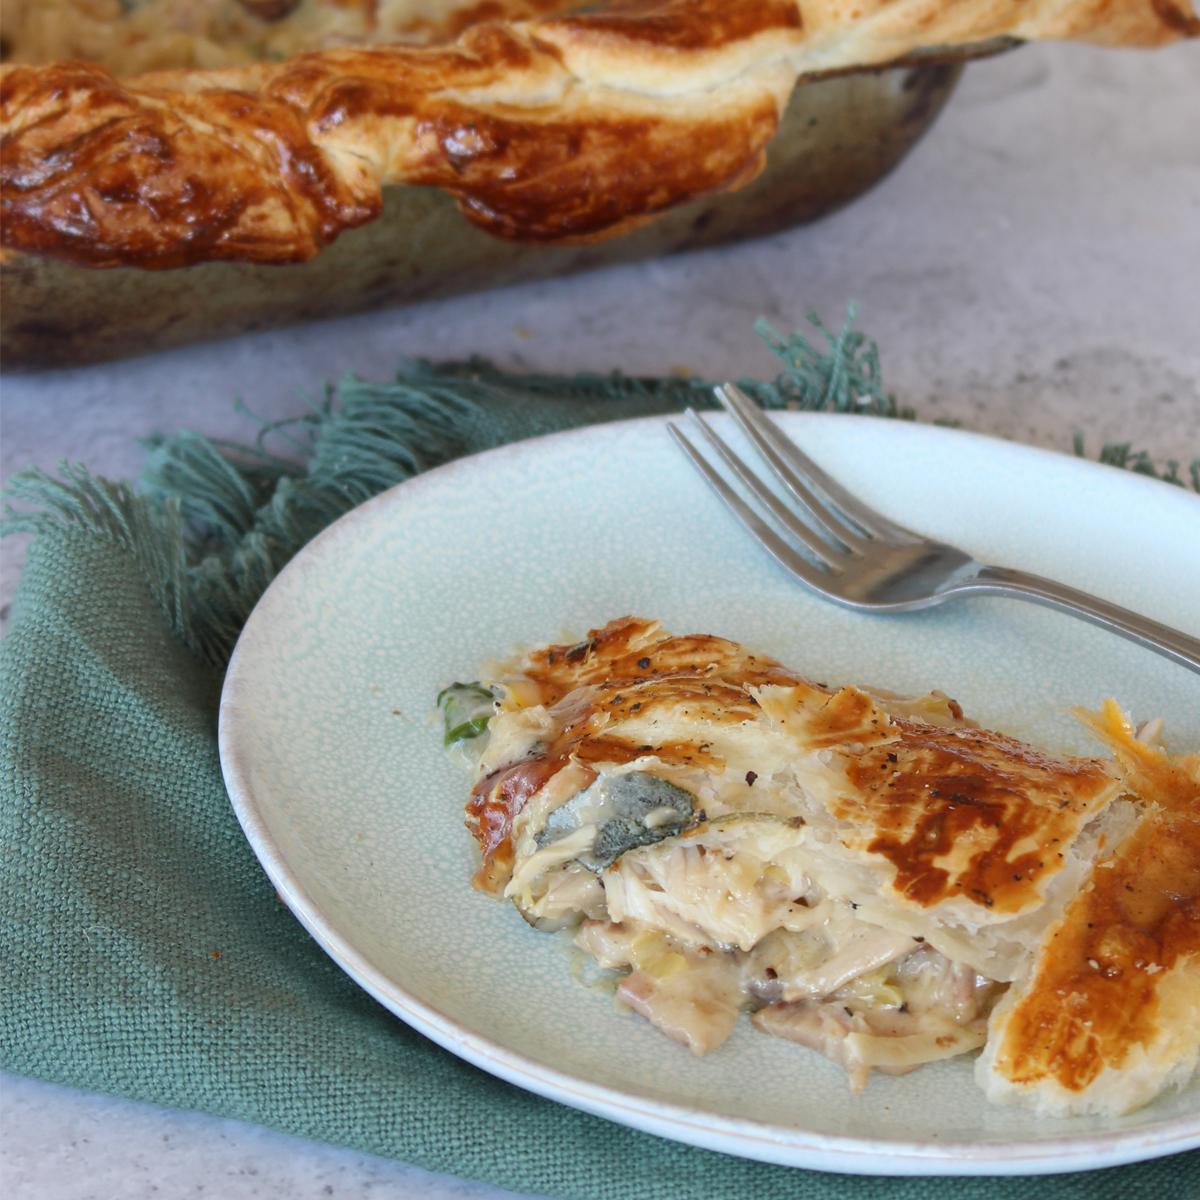 Pork Pot Pie - Tenderloin